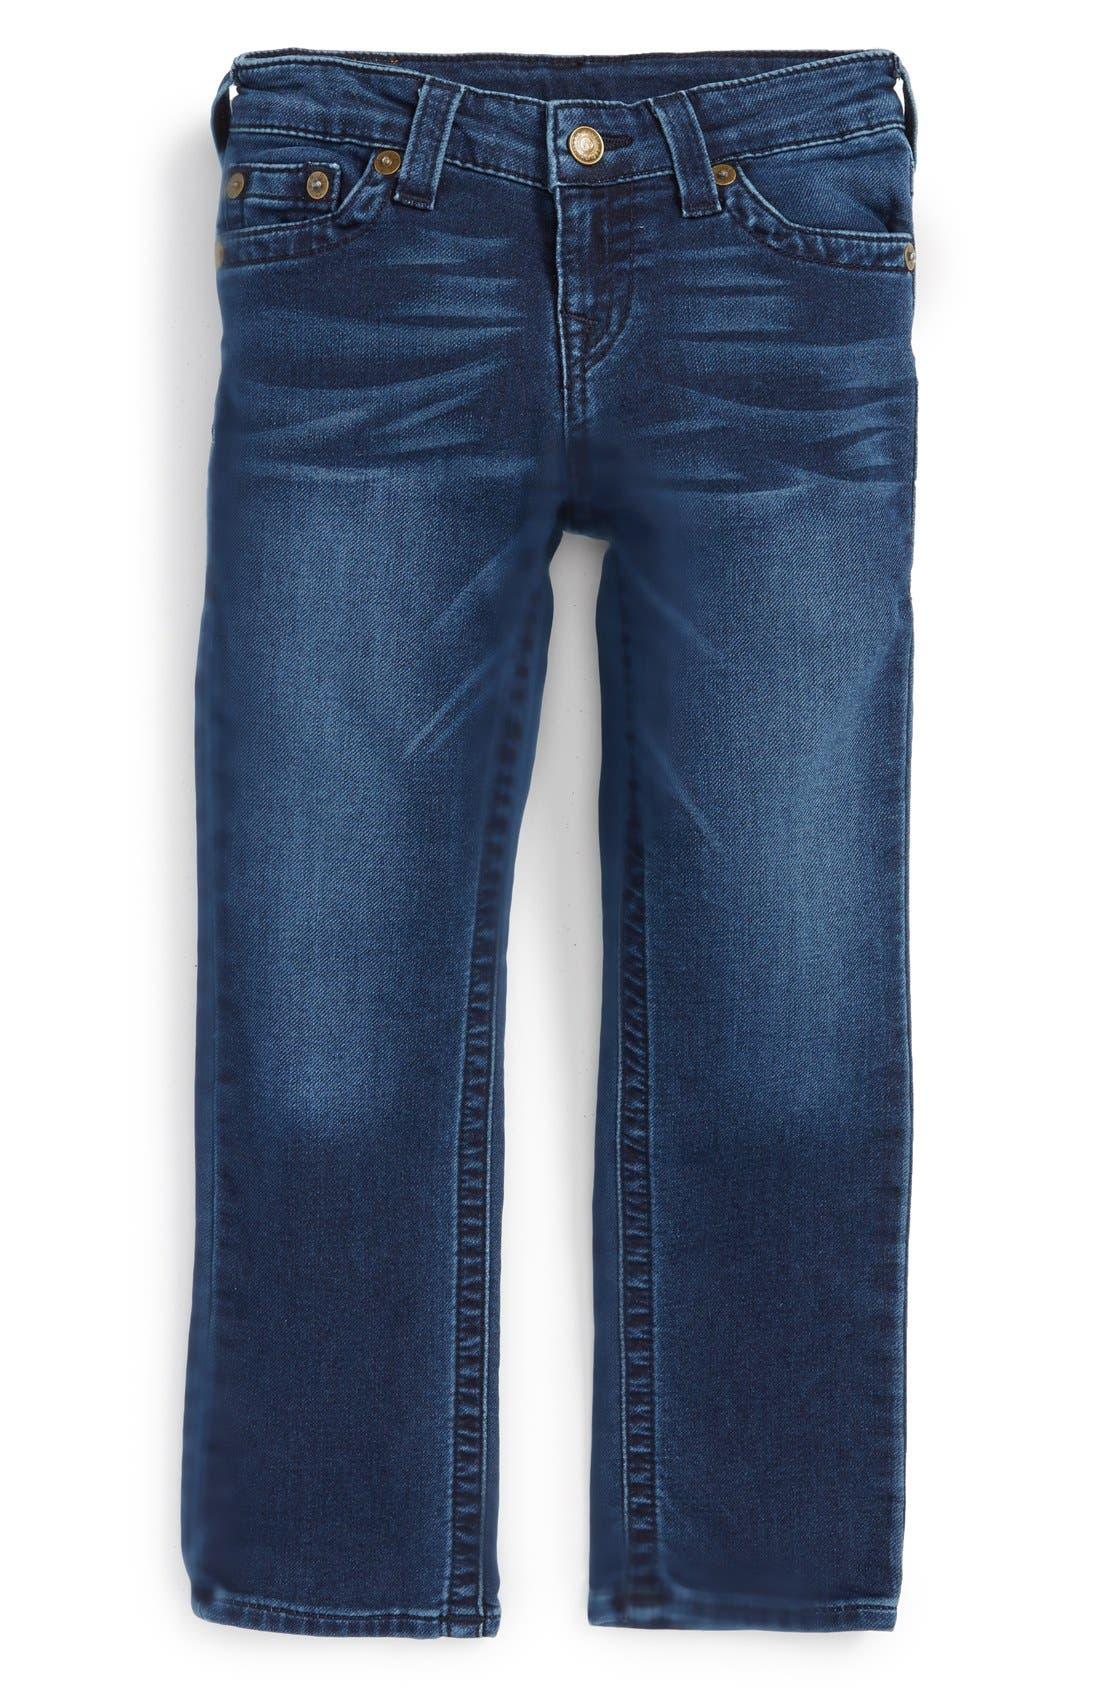 Main Image - True Religion Brand Jeans 'Knit Sweatpant' Jeans (Toddler Boys & Little Boys)